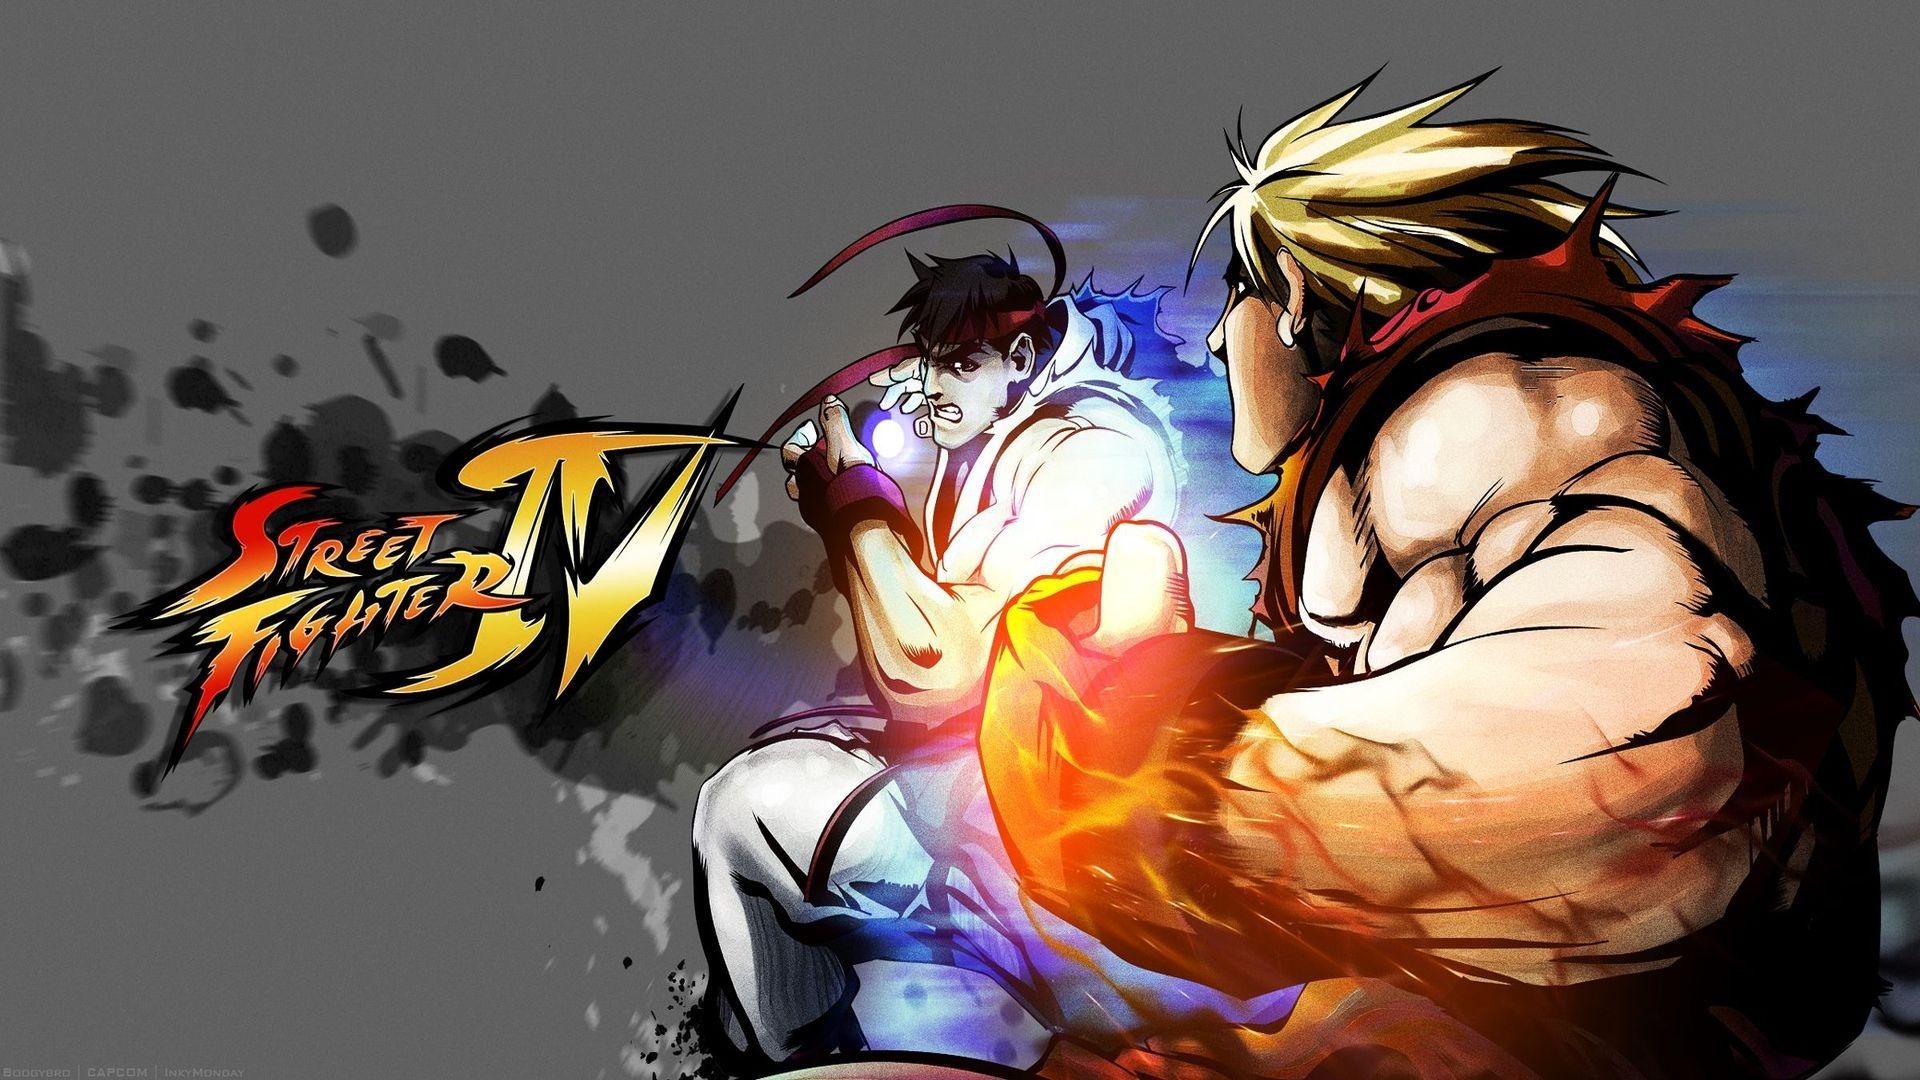 Street Fighter HD Wallpaper